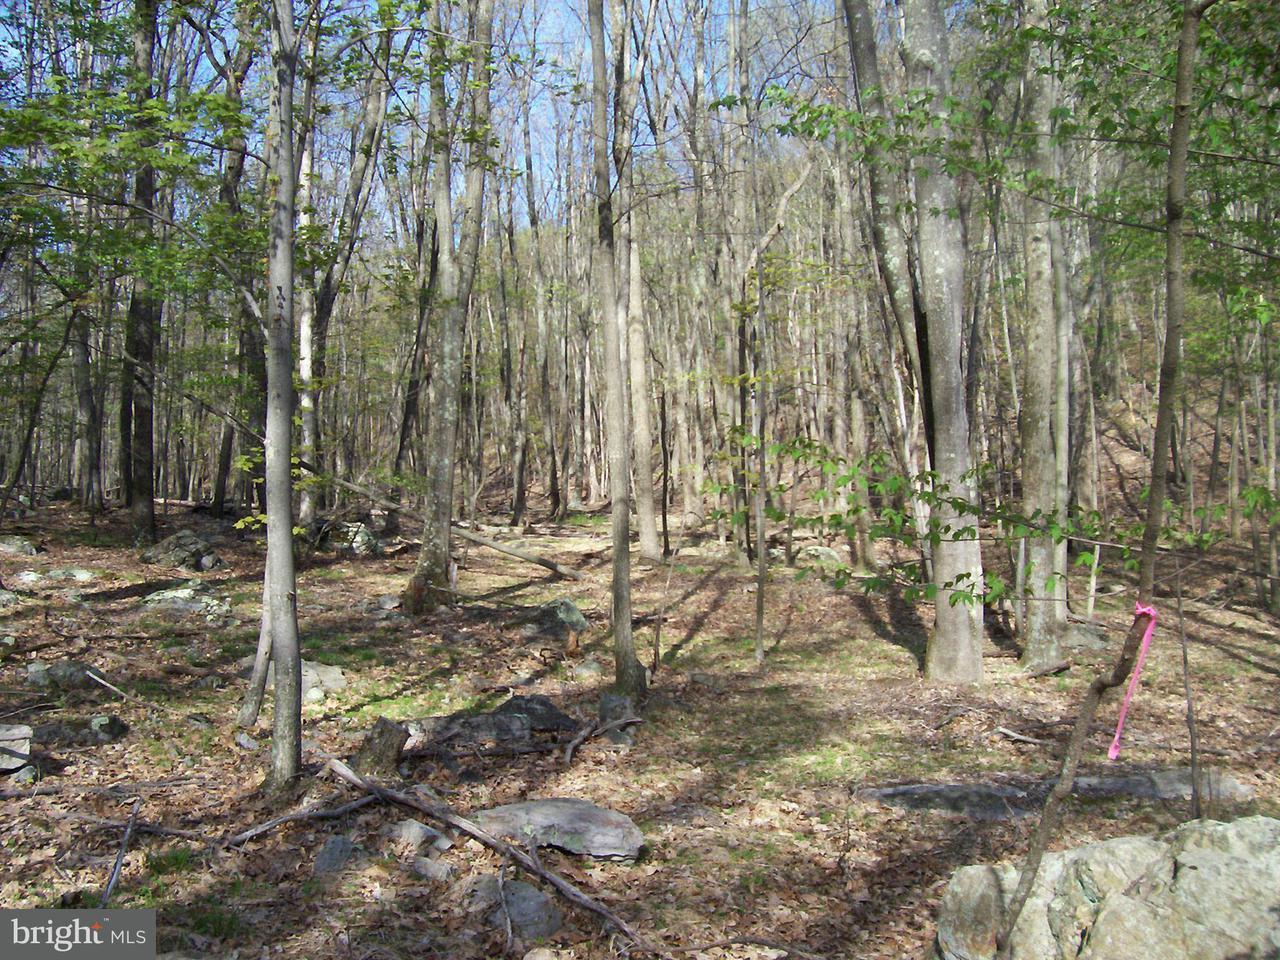 Land for Sale at 3 Lost River Glen Wardensville, West Virginia 26851 United States